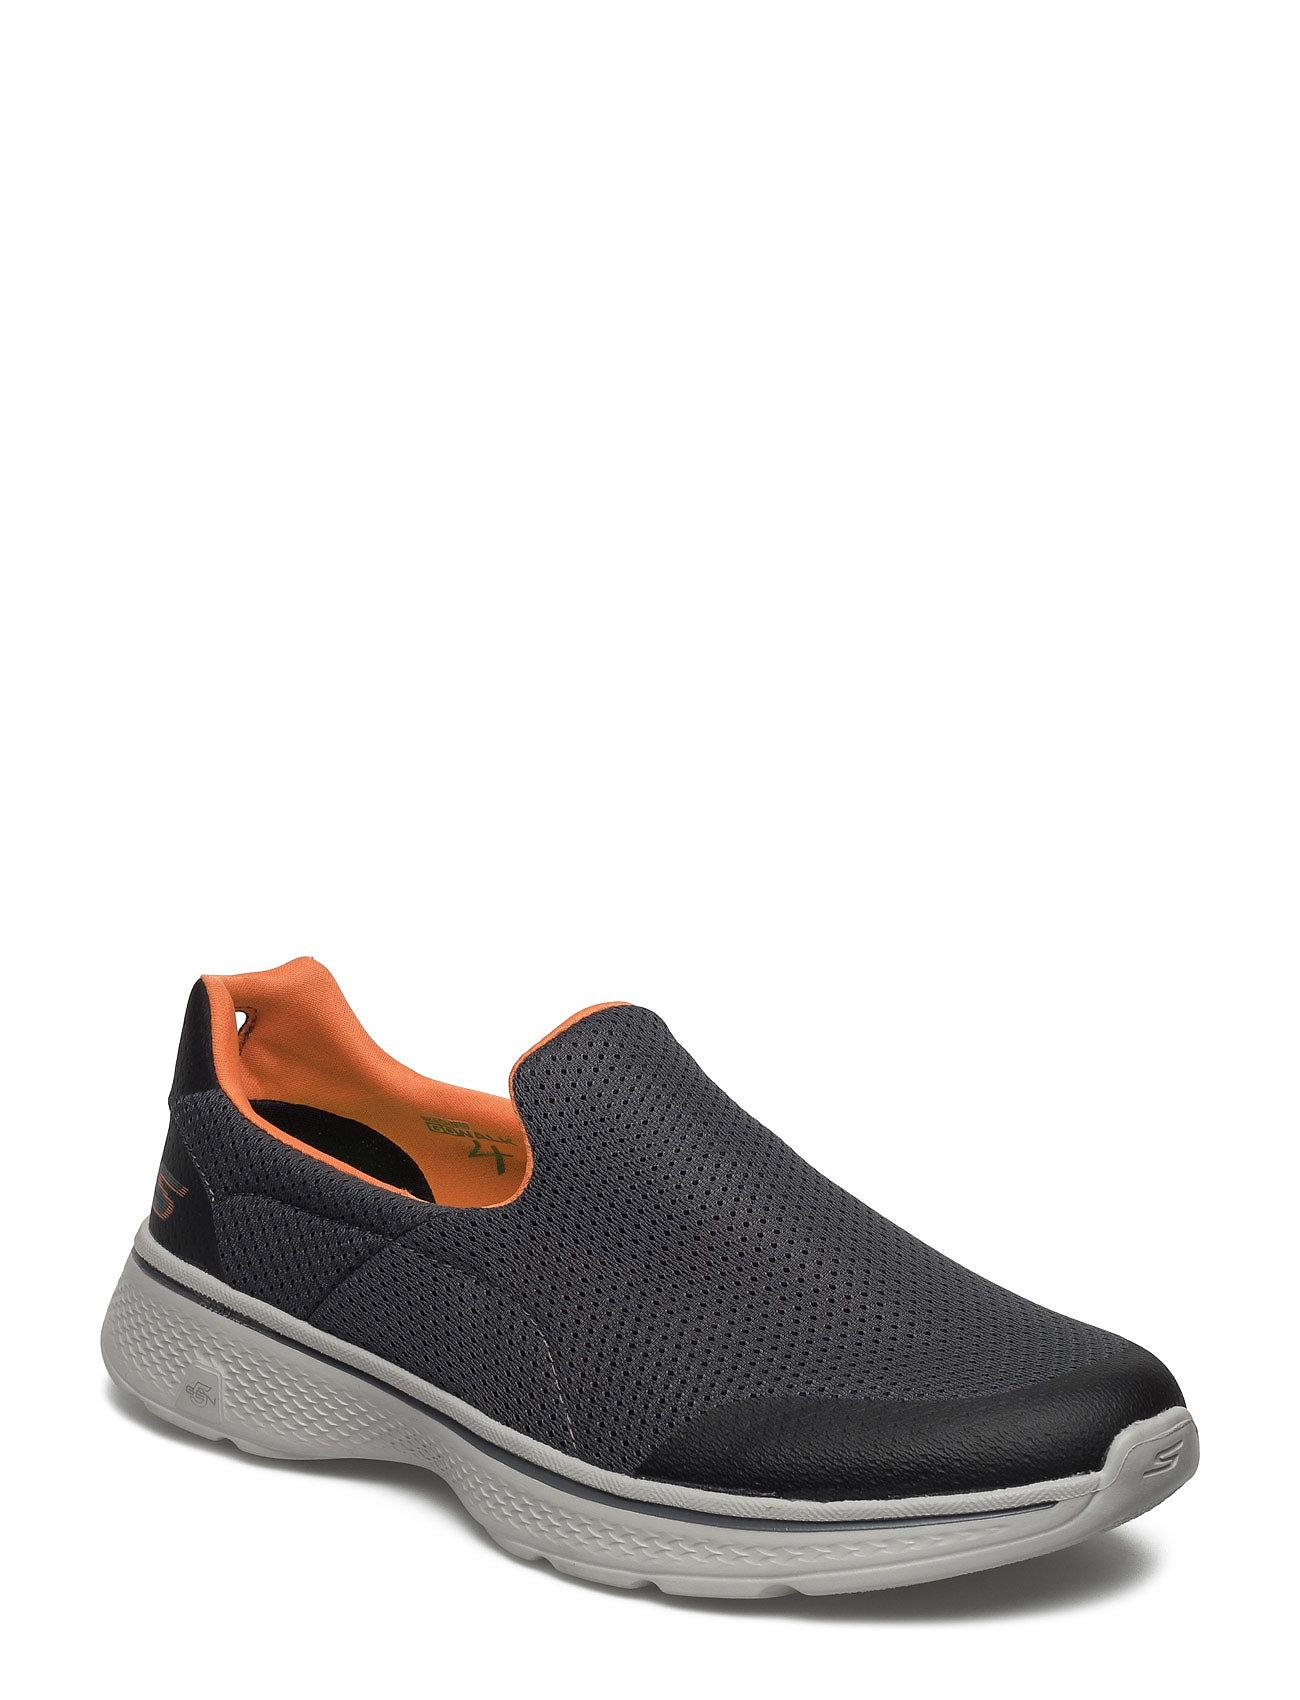 Mens Go Walk 4 - Incredible Skechers Sneakers til Herrer i